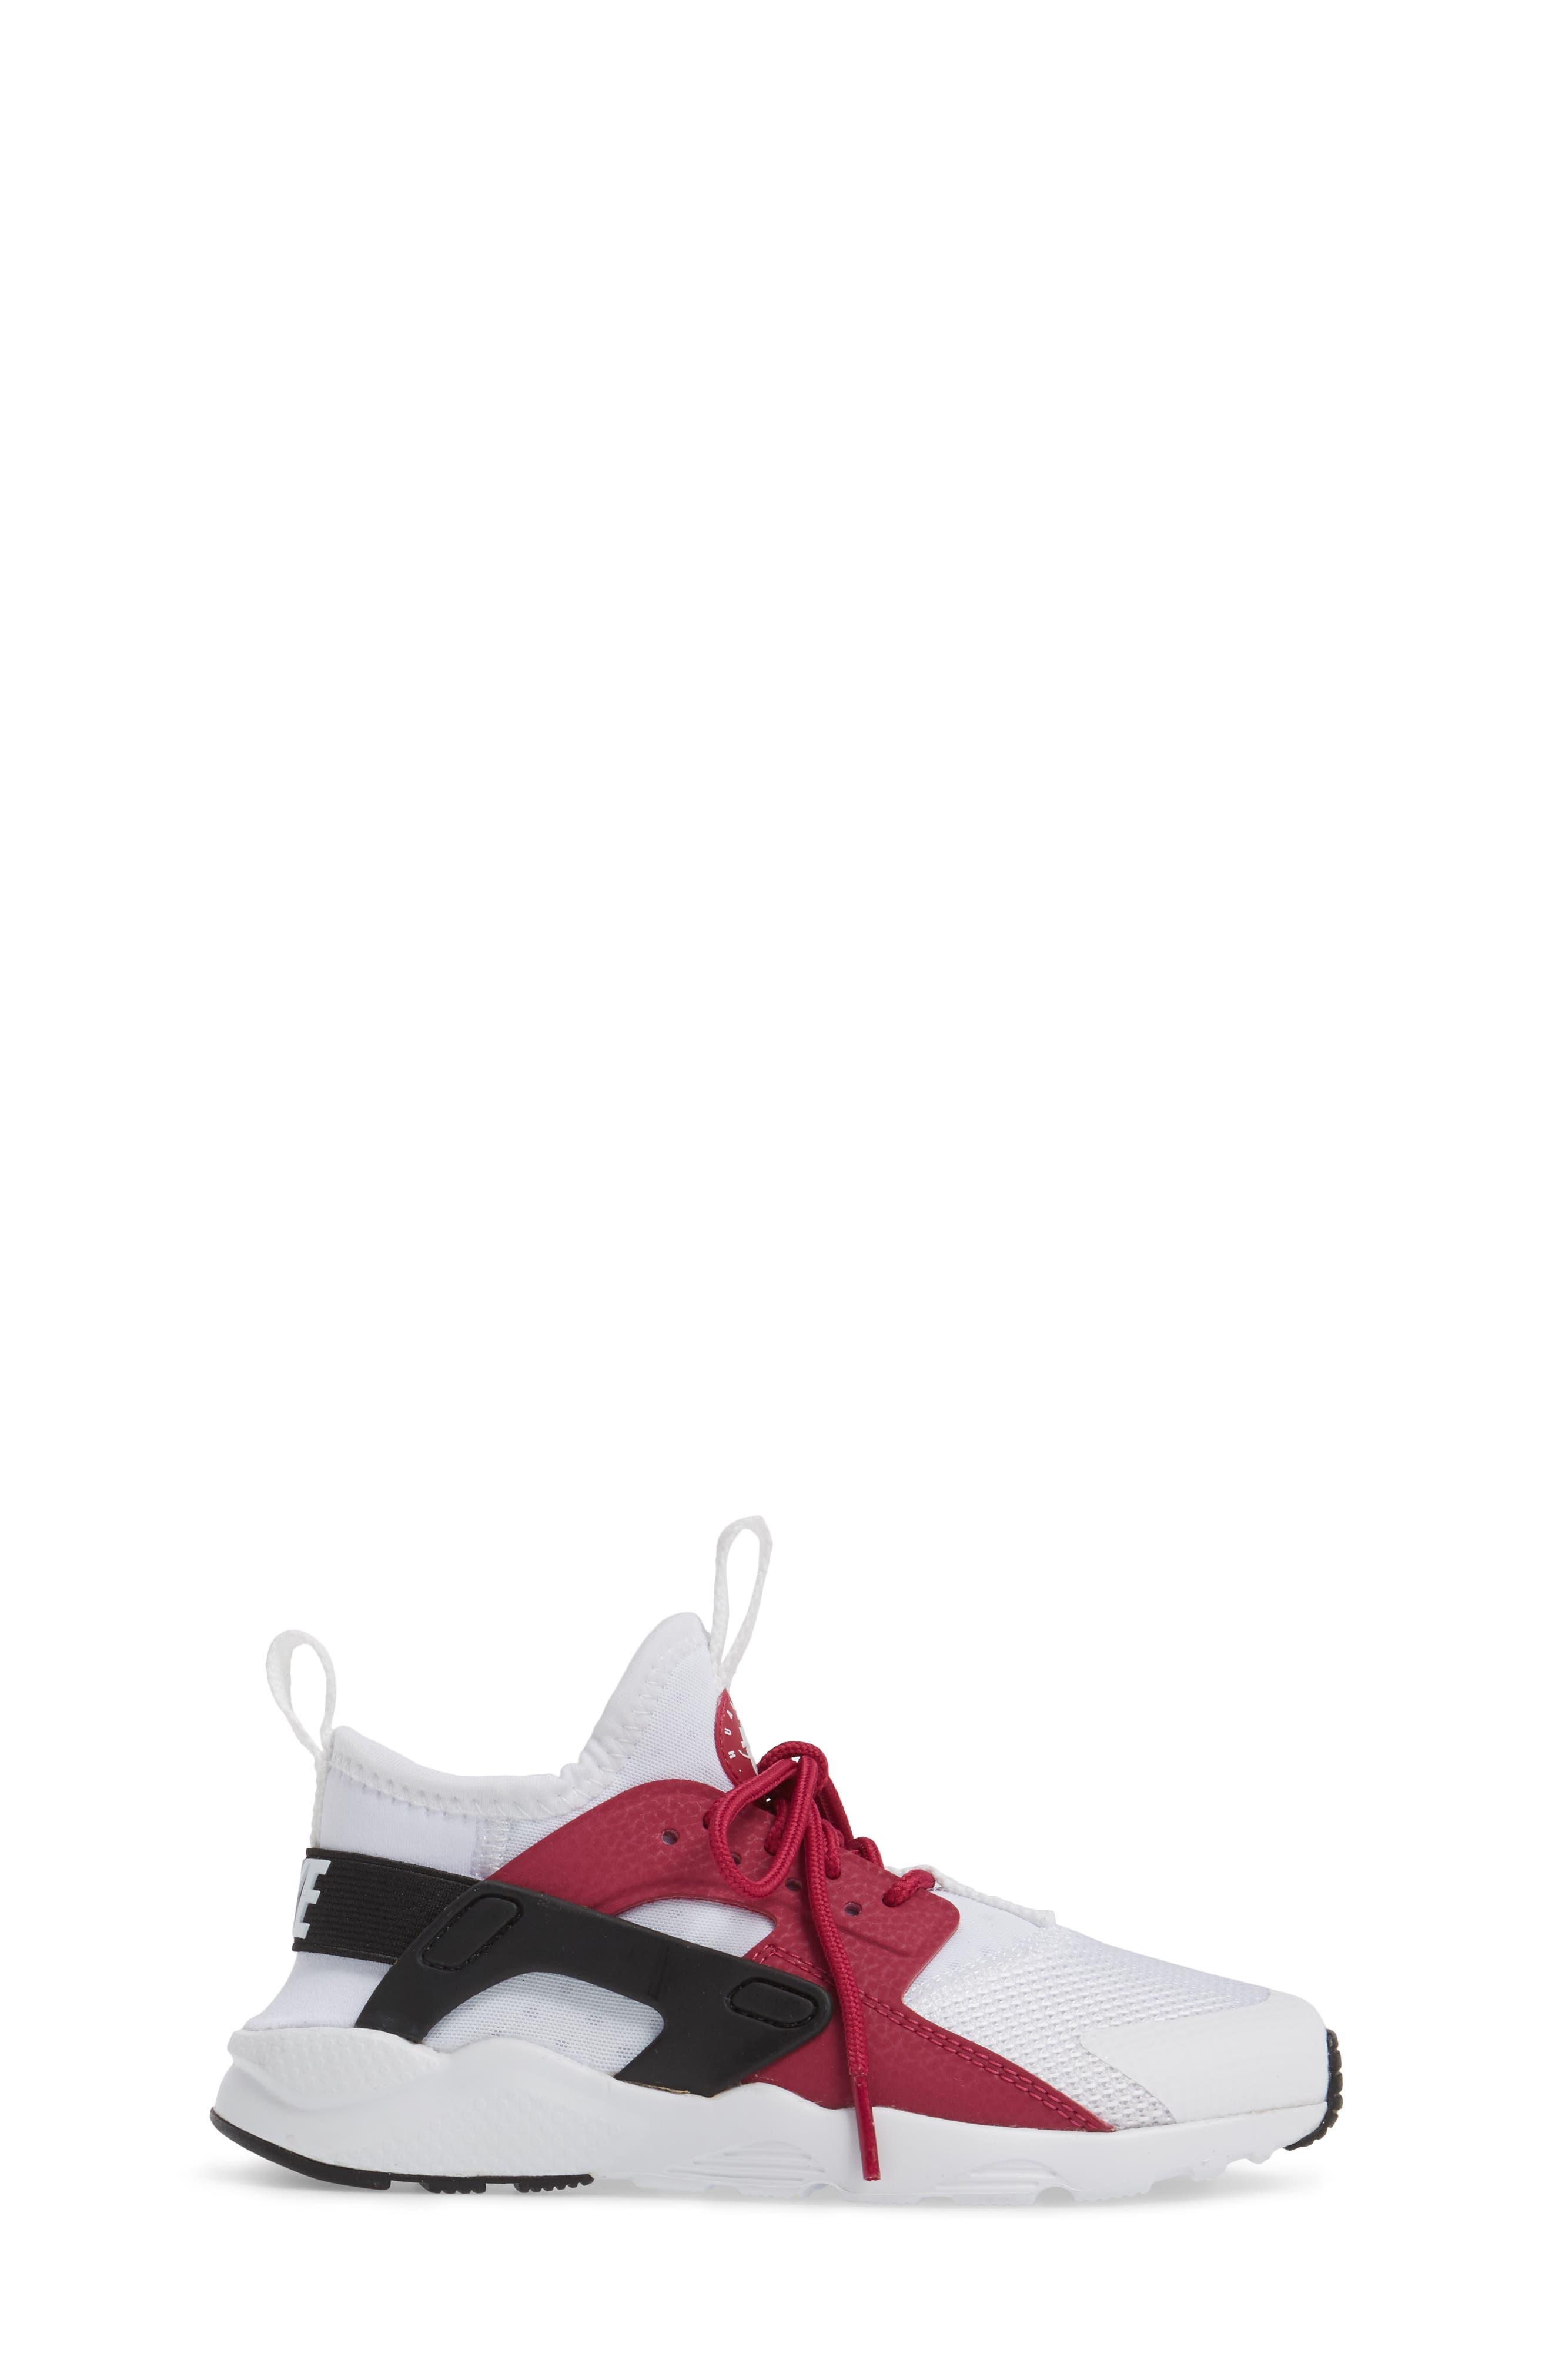 Air Huarache Run Ultra Sneaker,                             Alternate thumbnail 3, color,                             White/ Sport Fuchsia/ Black